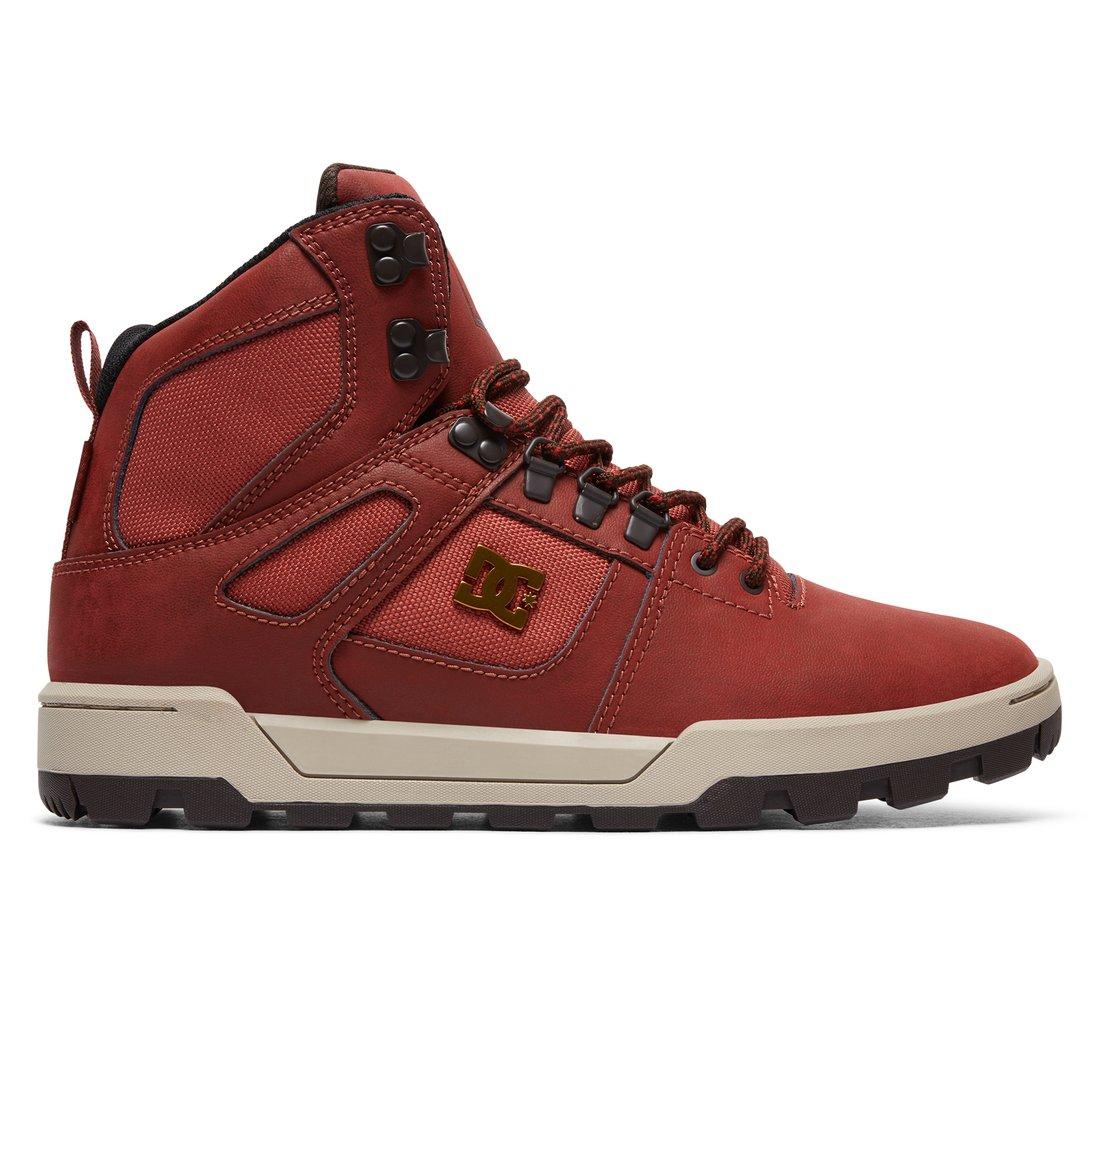 DC Shoes Boots hiver Spartan High Wr Boot r63Ou